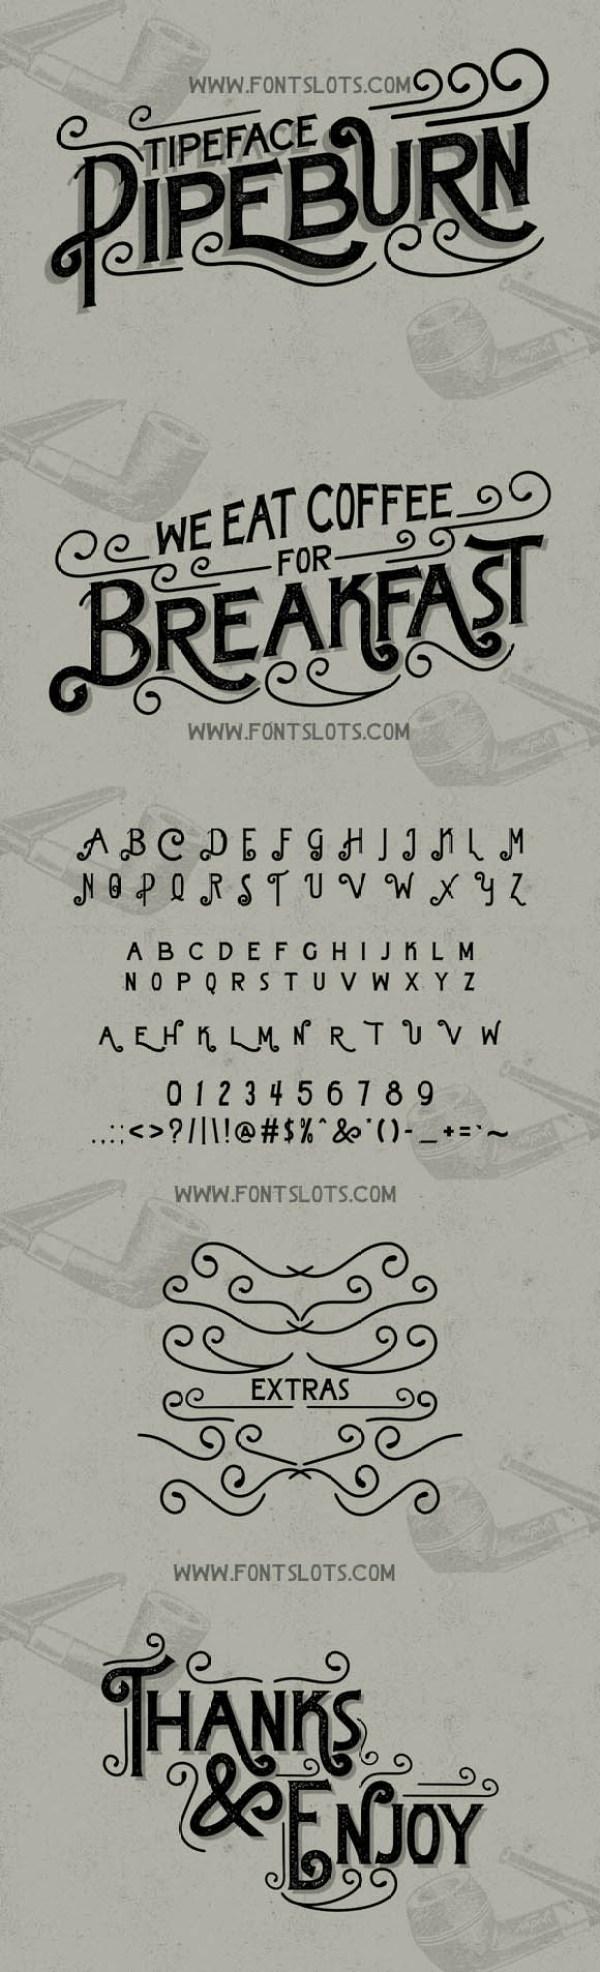 Pipeburn Typeface 01